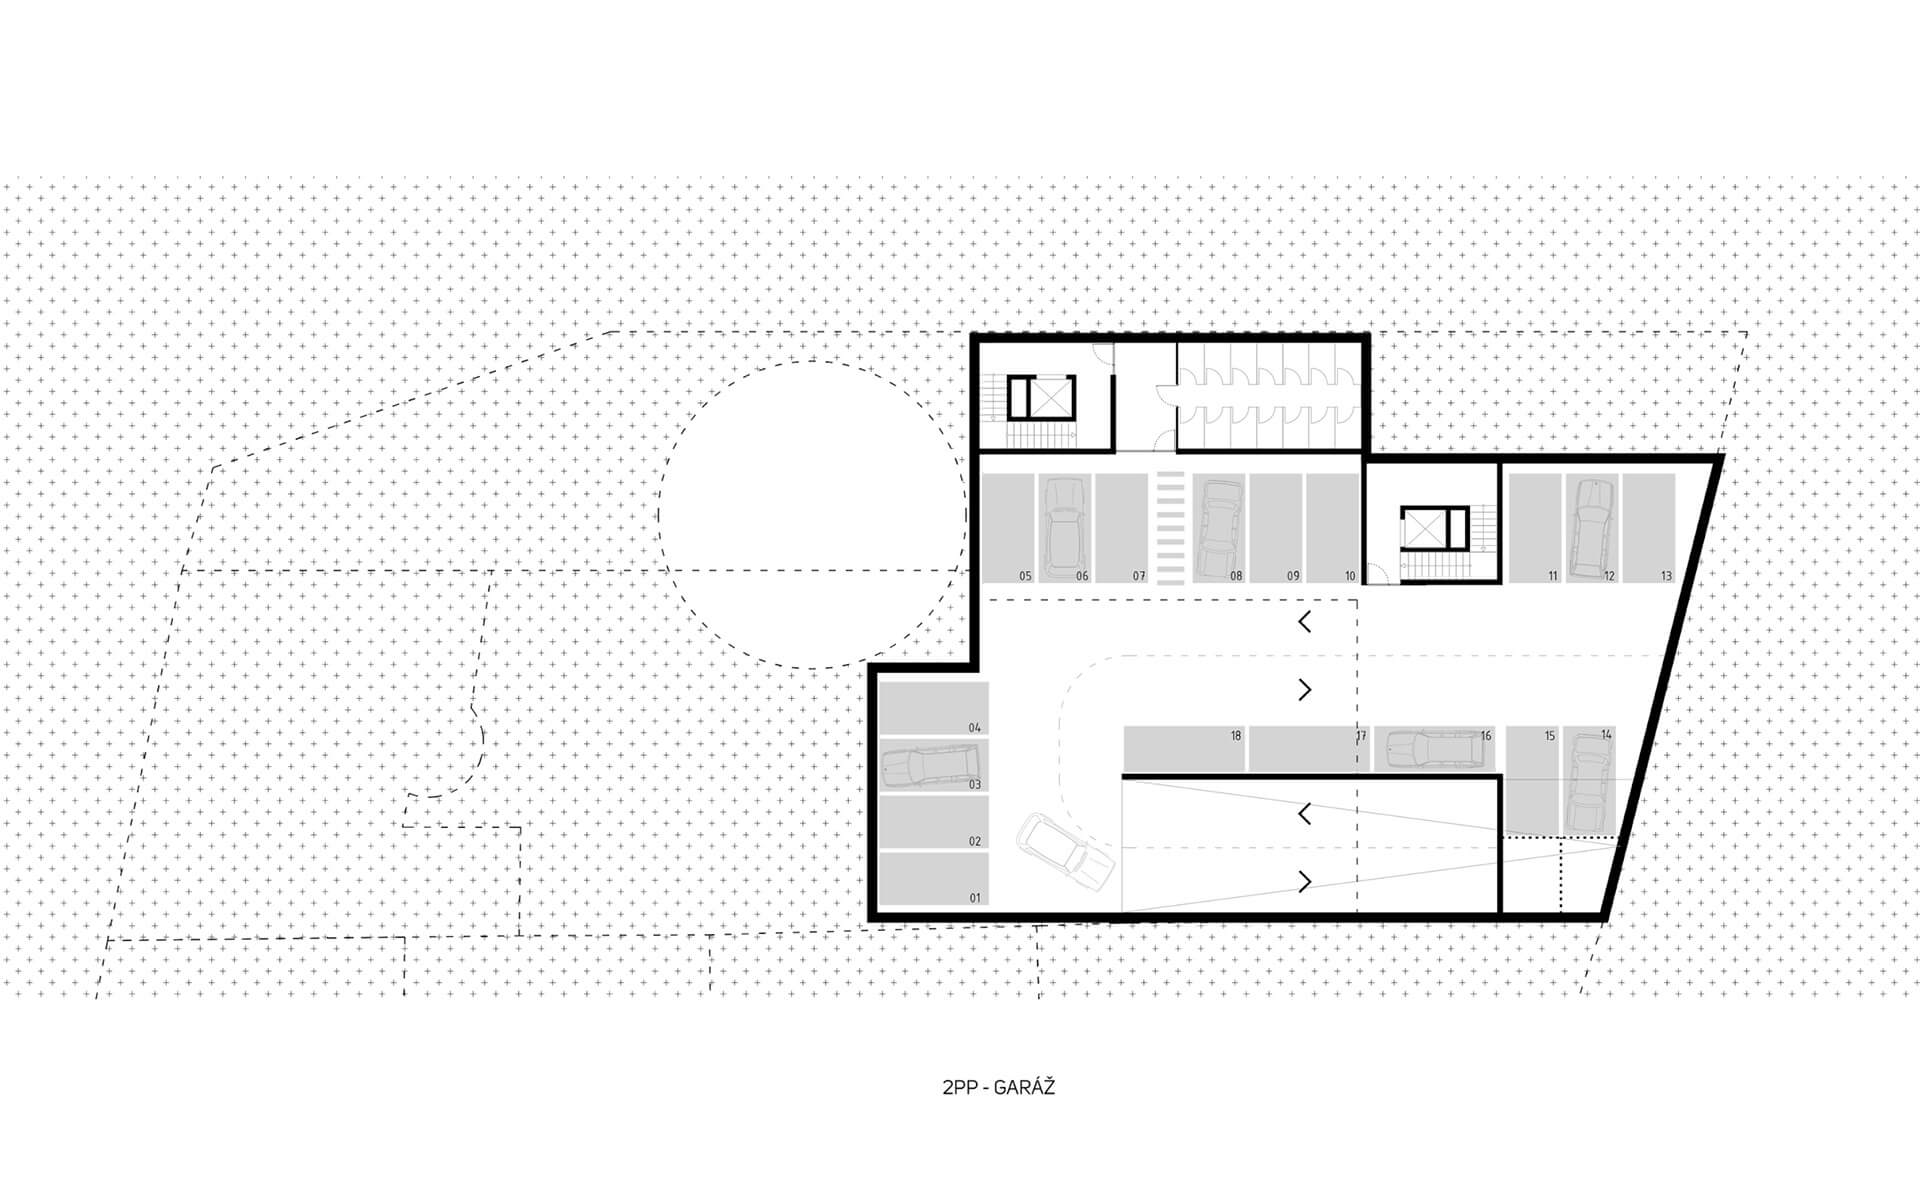 sutaz-bytovy-dom-ostrava_schema_gif_1